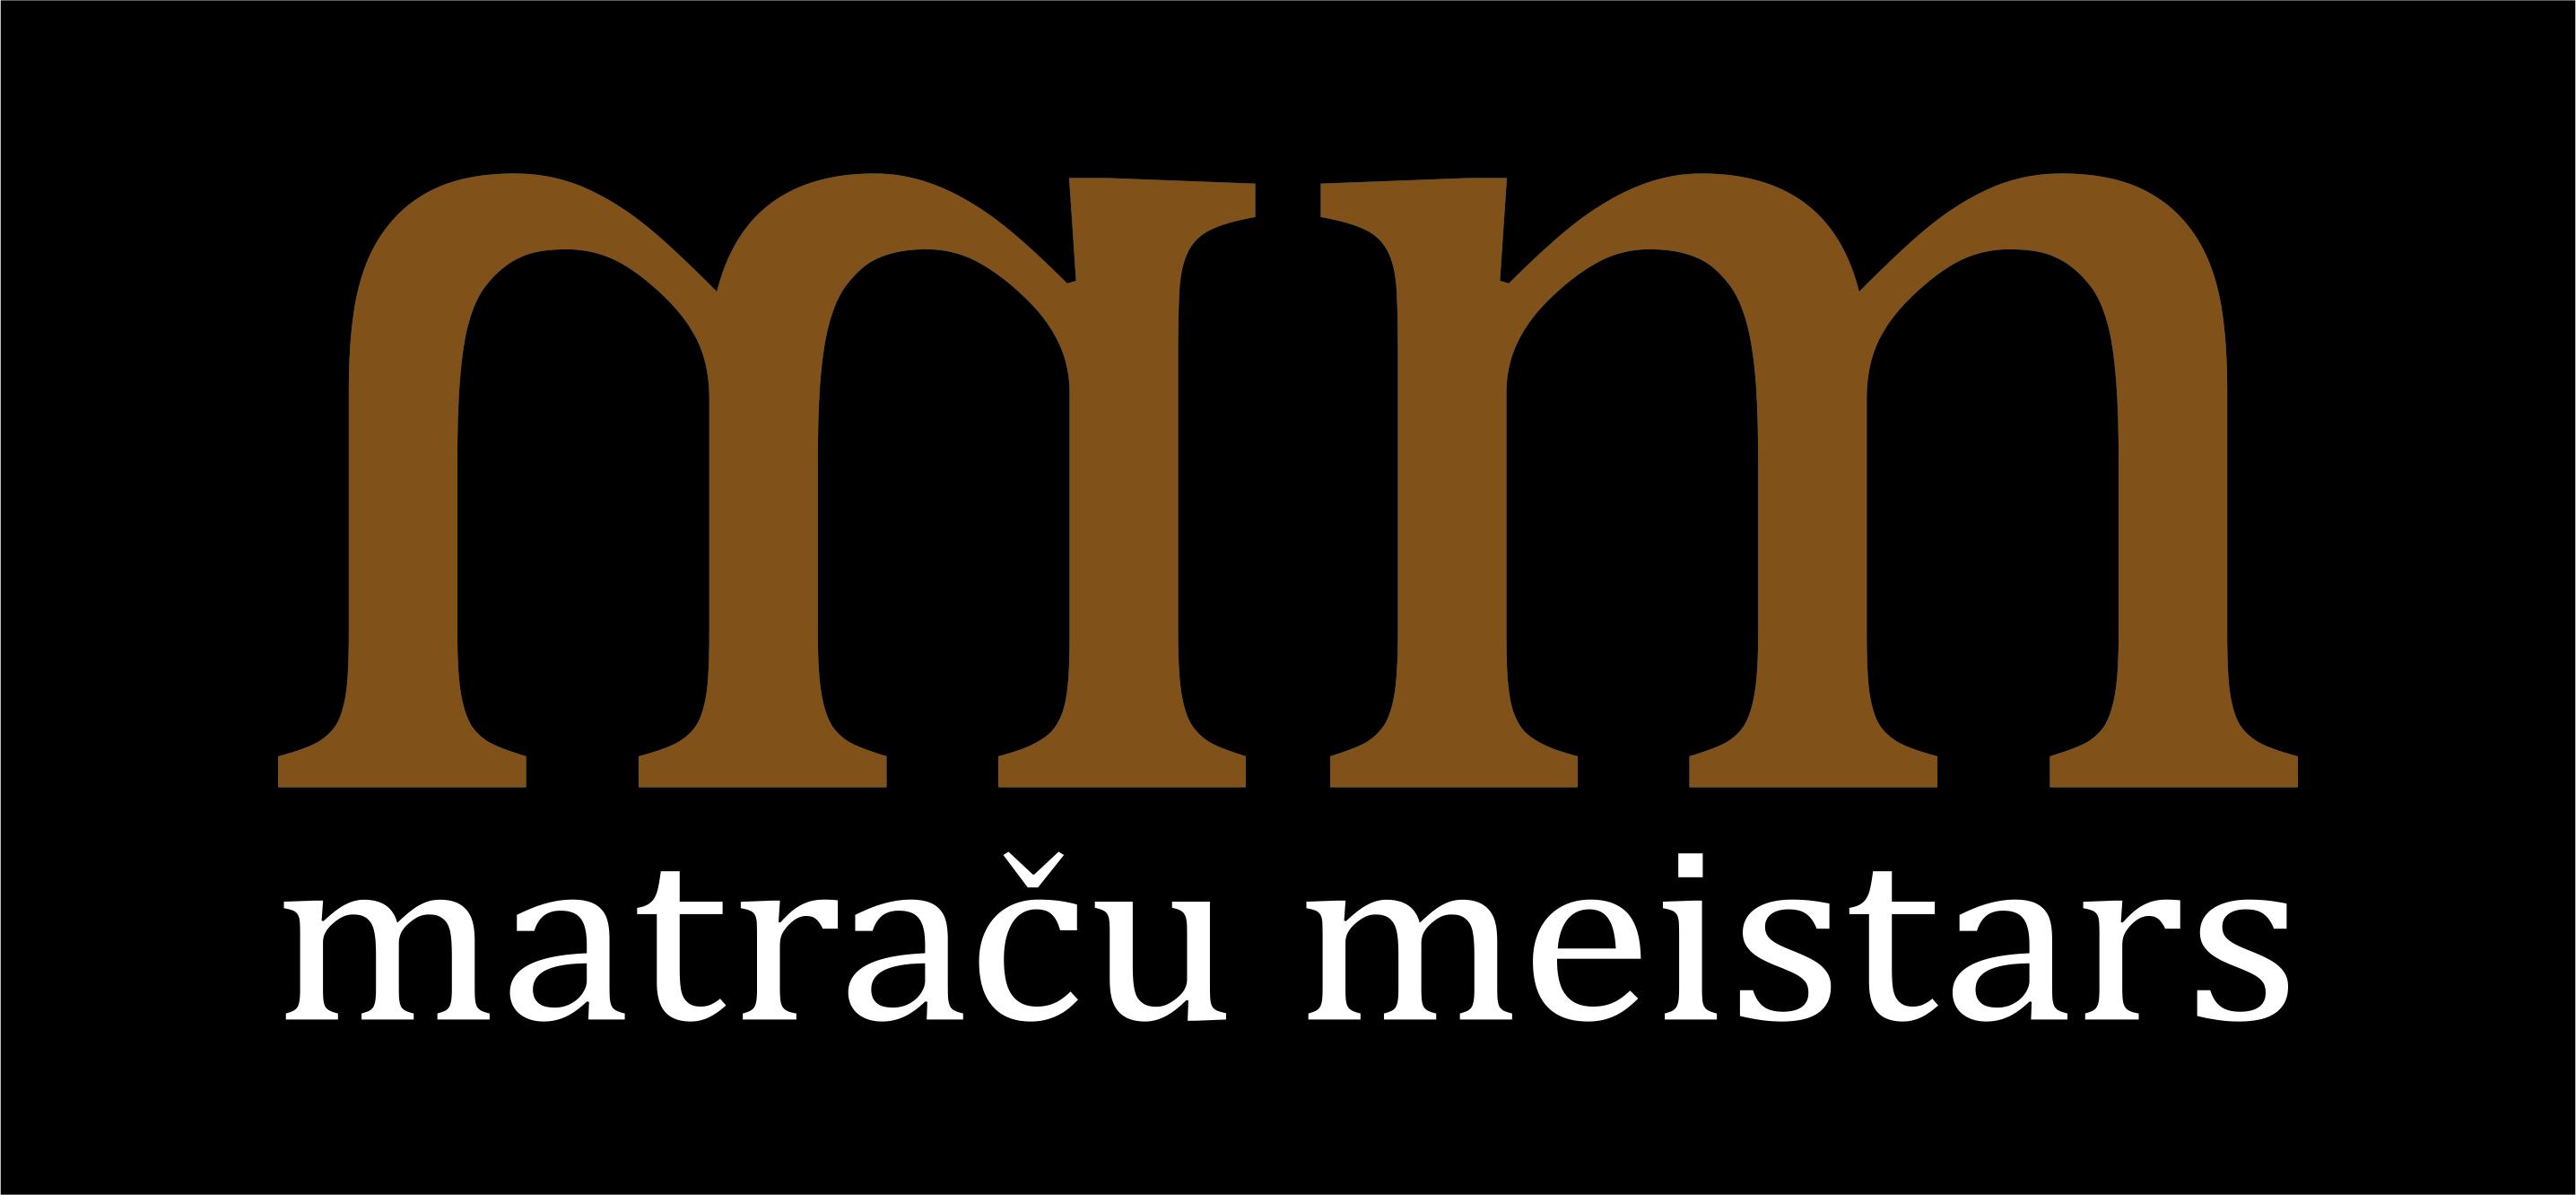 MATRAČU MEISTARS logo